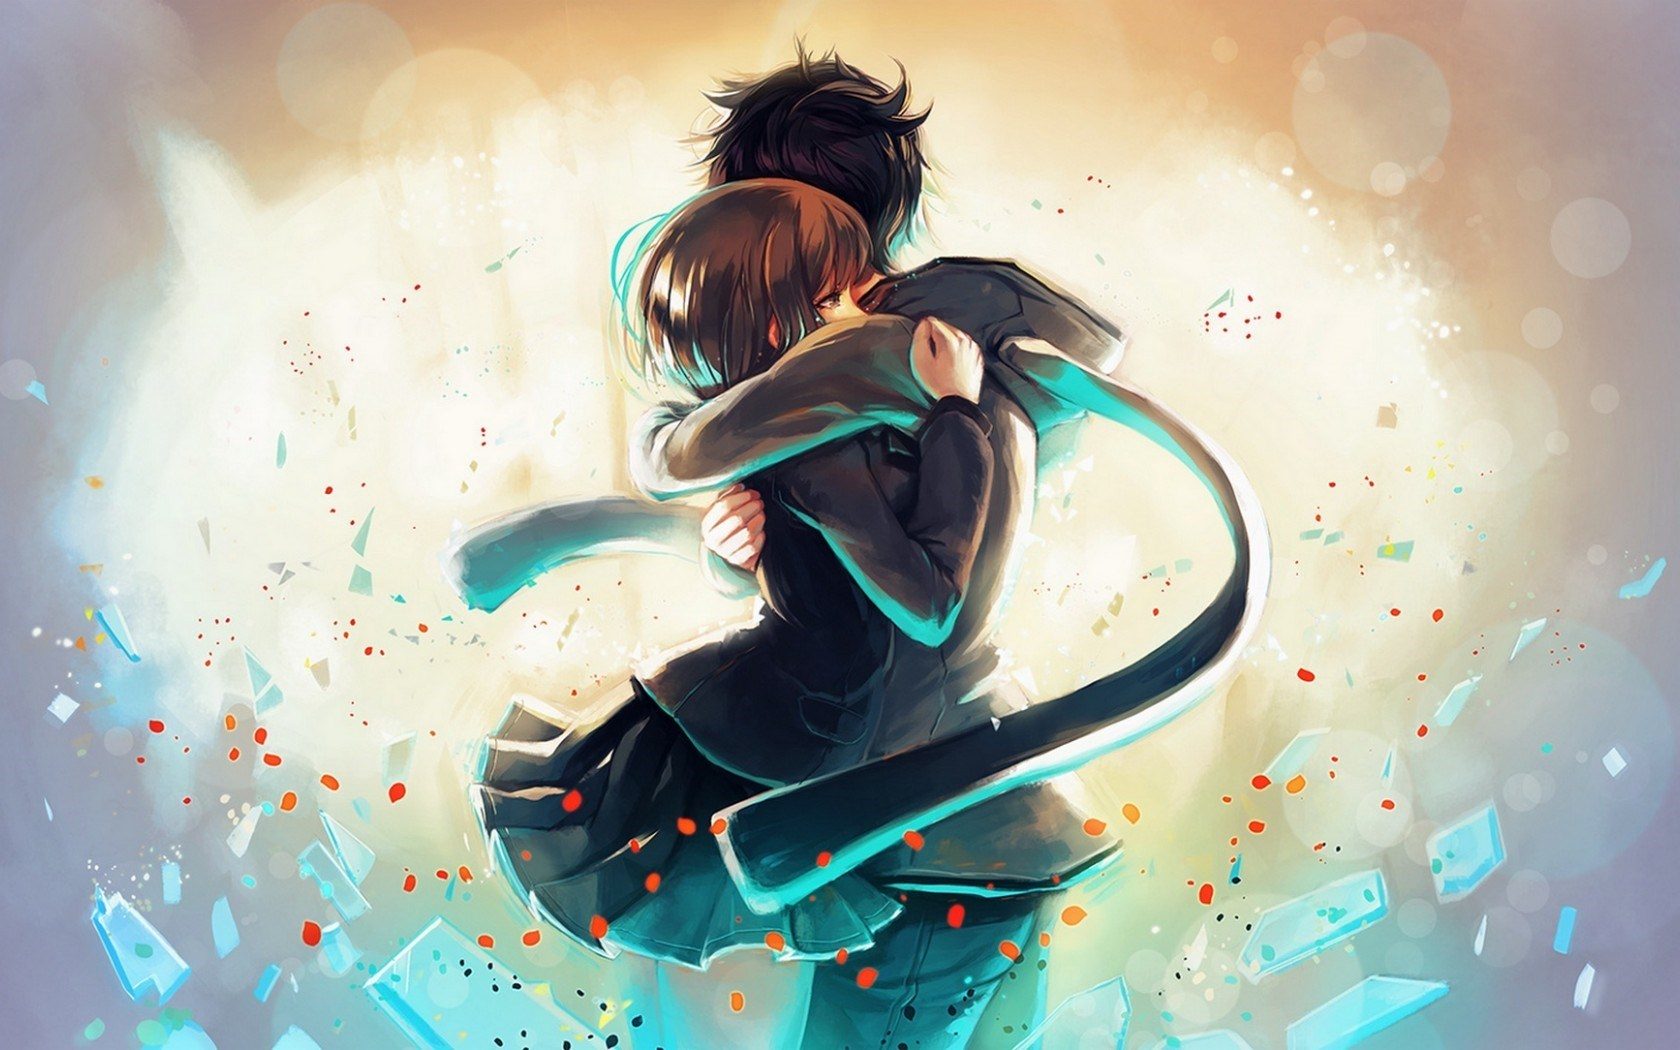 art couple hug love happy manga anime love cute wallpaper 1680x1050